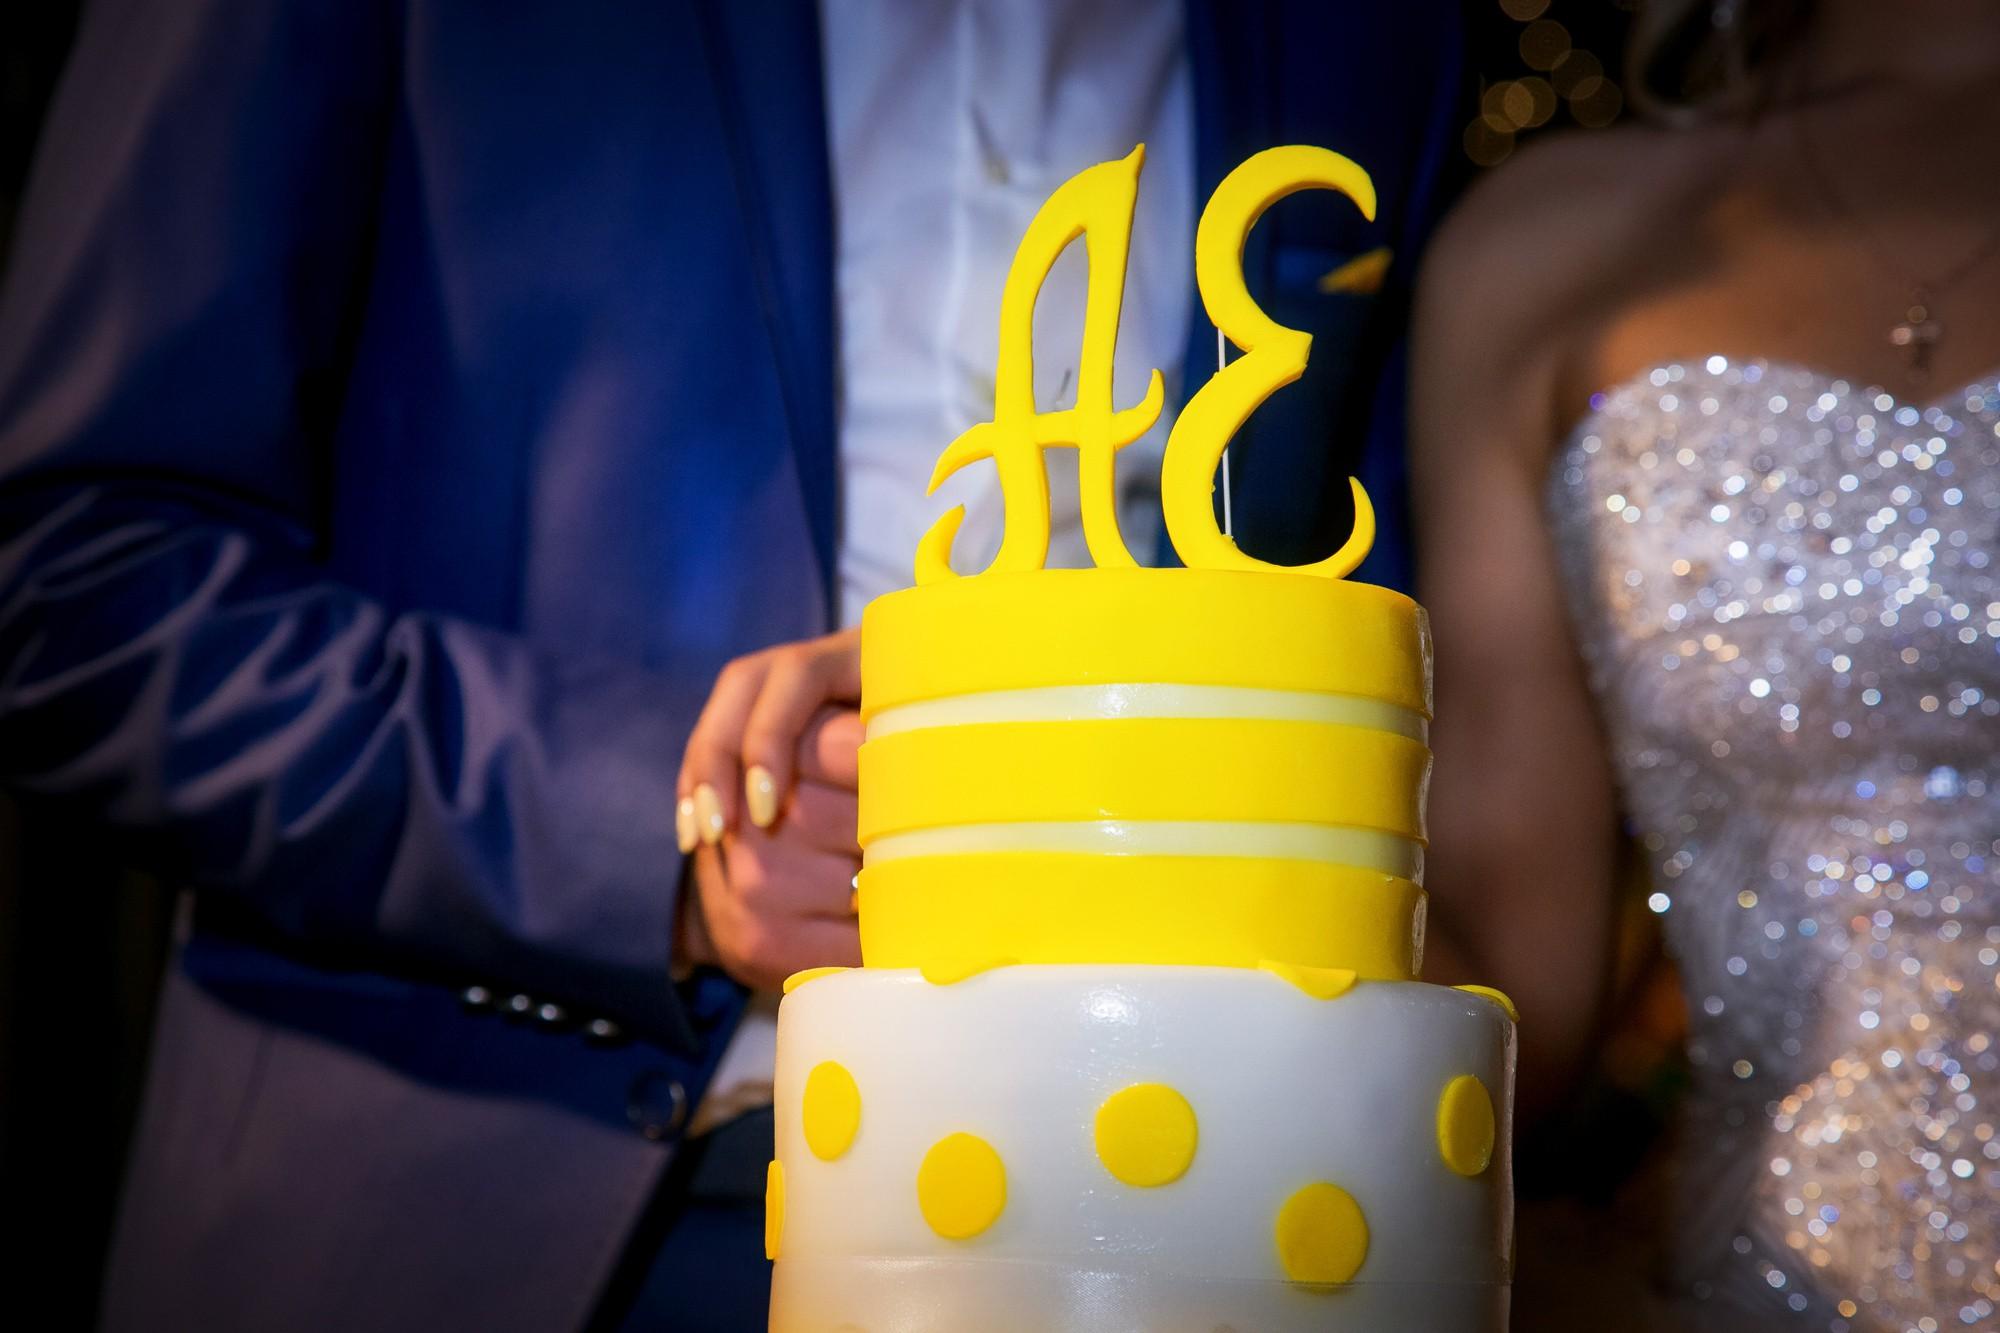 Свадьба в желтых тонах, Царицыно, Москва, 2014 г.